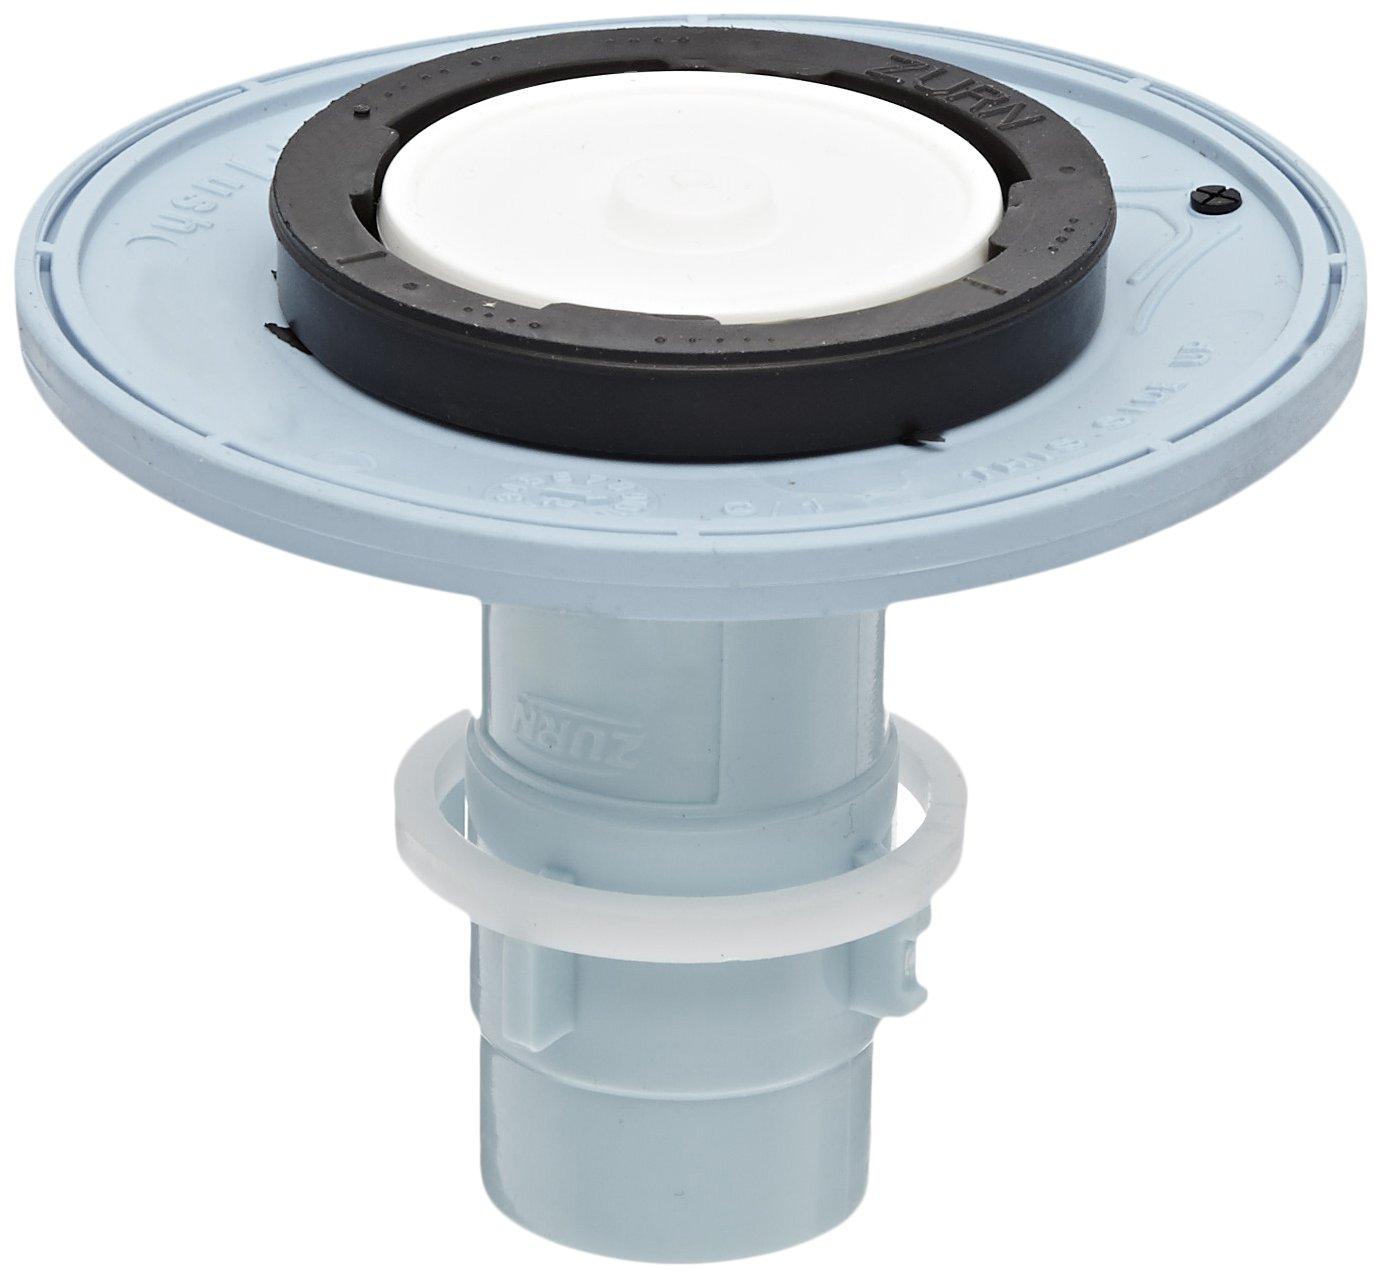 Zurn AquaFlush Closet Repair Kit, P6000-ECR-WS, 3.5 gpf, Crosses to Sloan A-38-A, Diaphragm Repair Kit